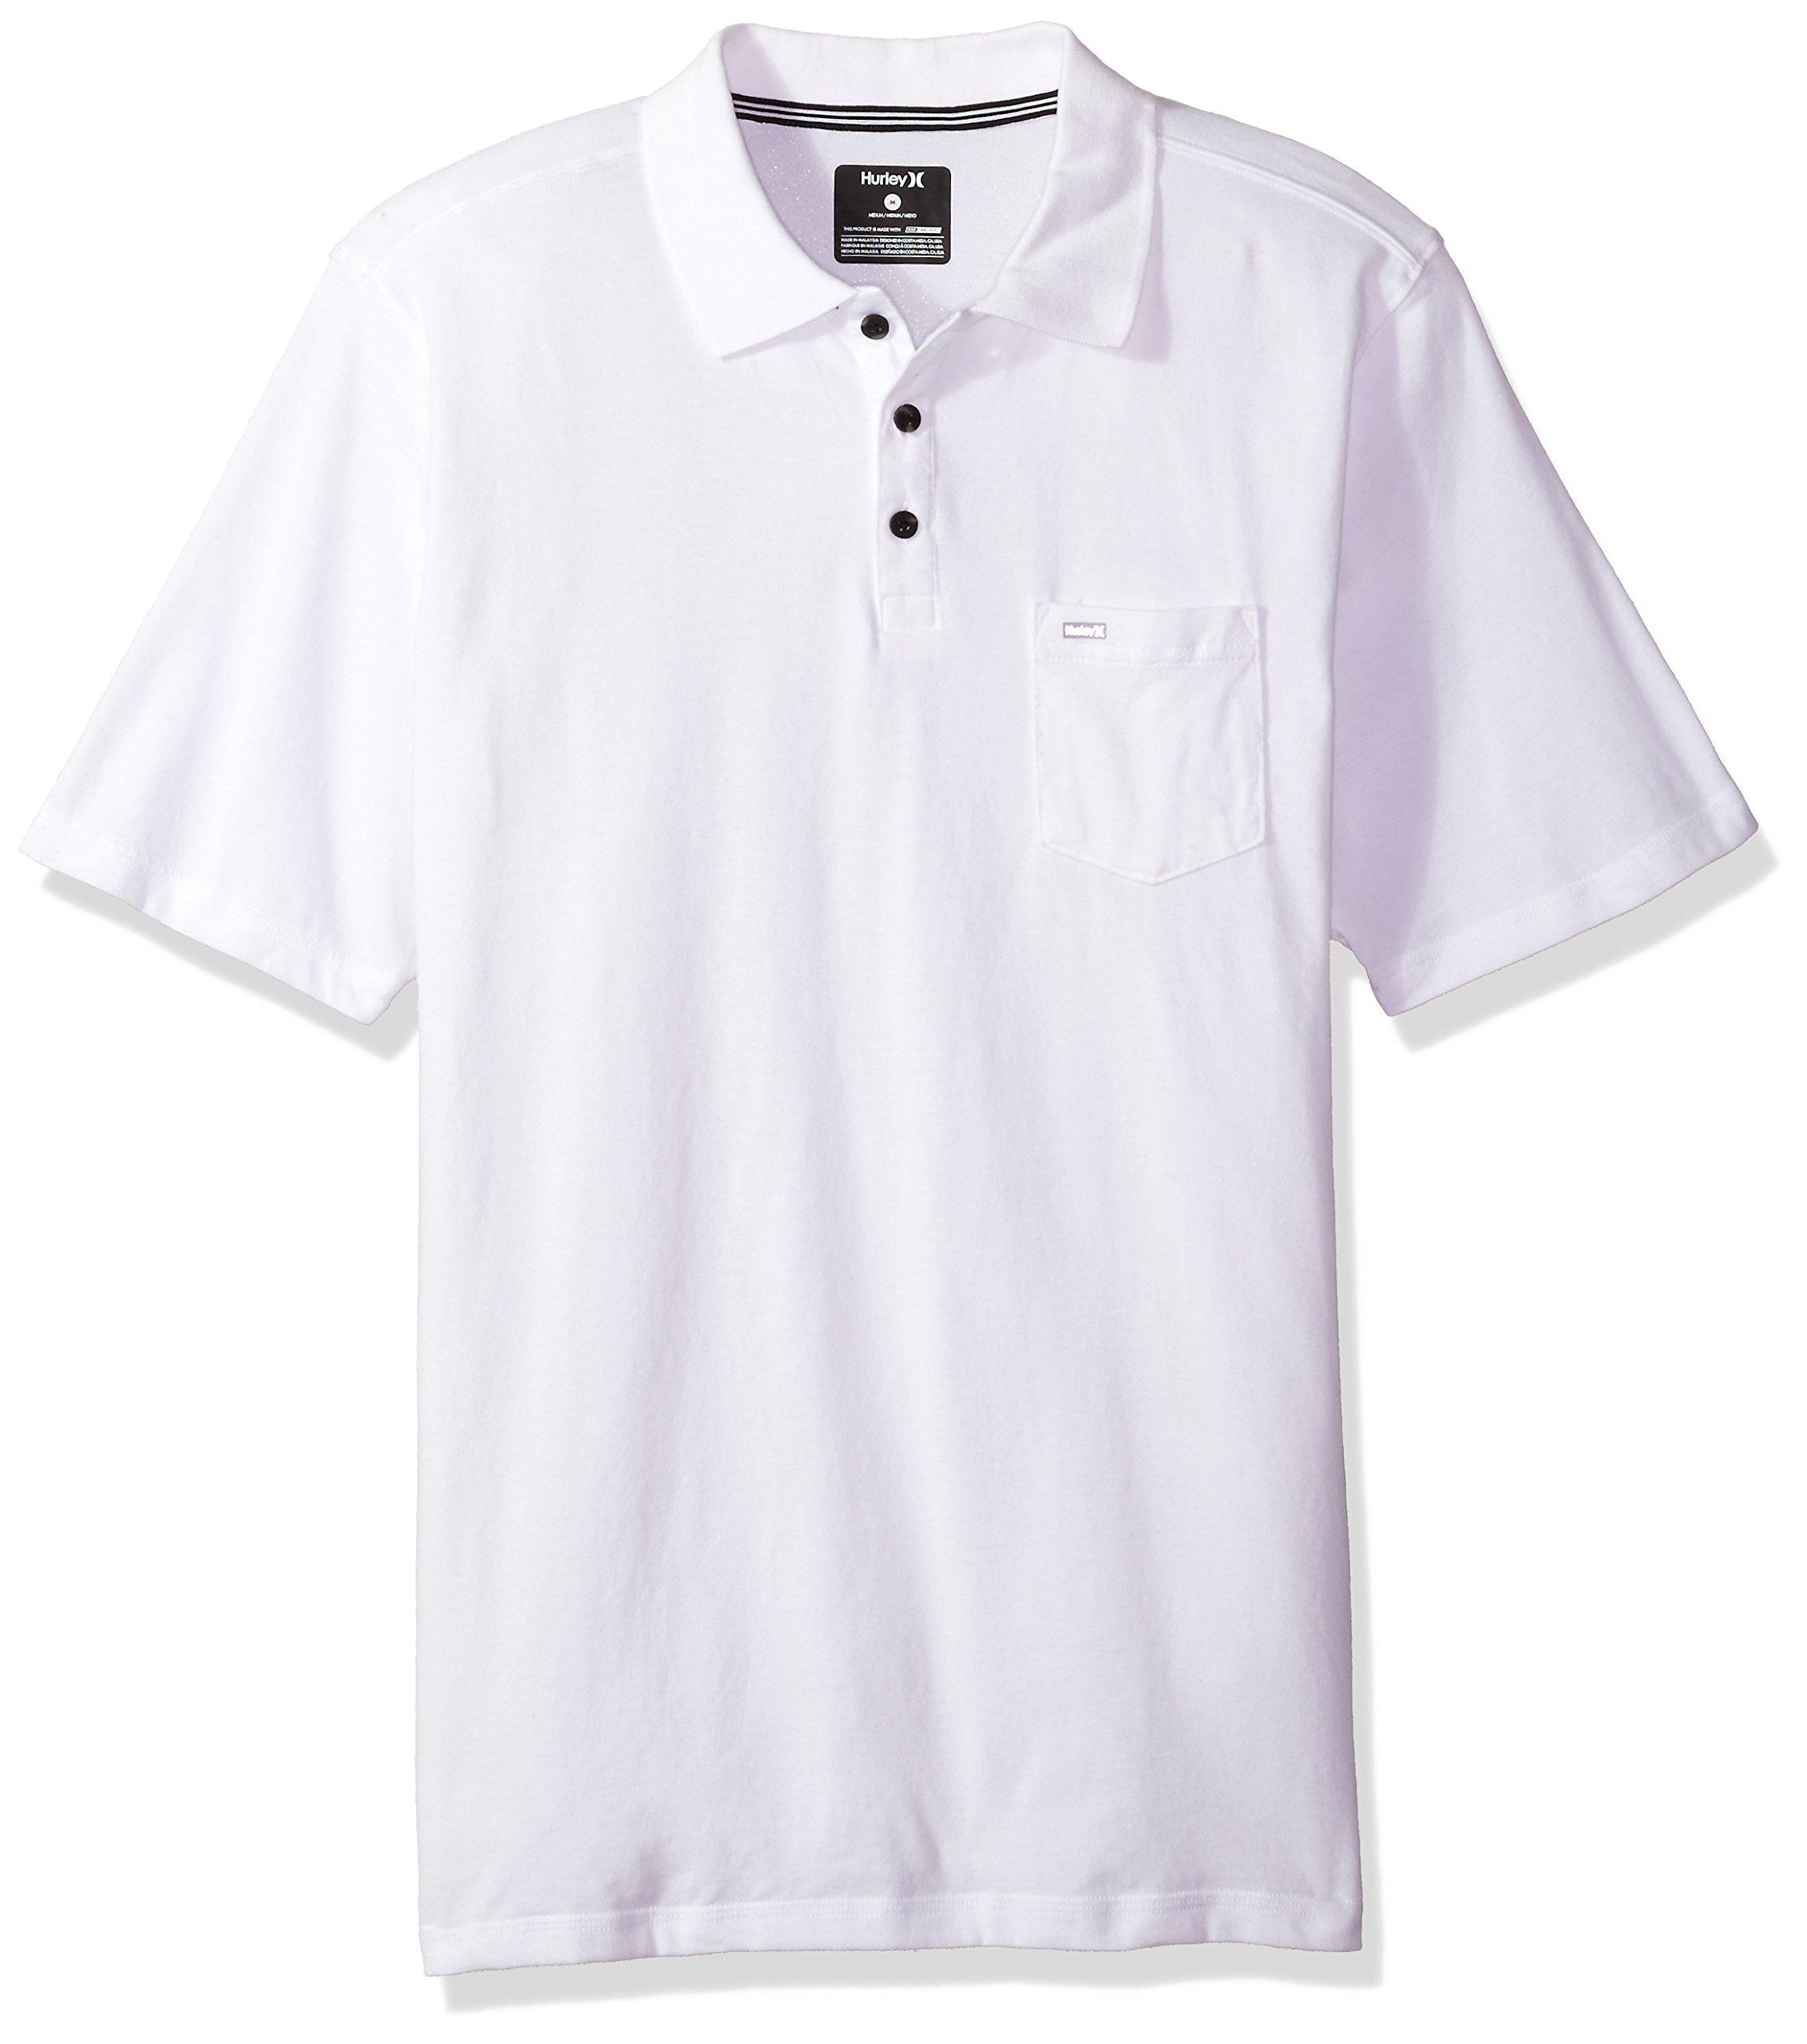 Hurley Men's Nike Dri-Fit Short Sleeve Lagos Polo, White, XL